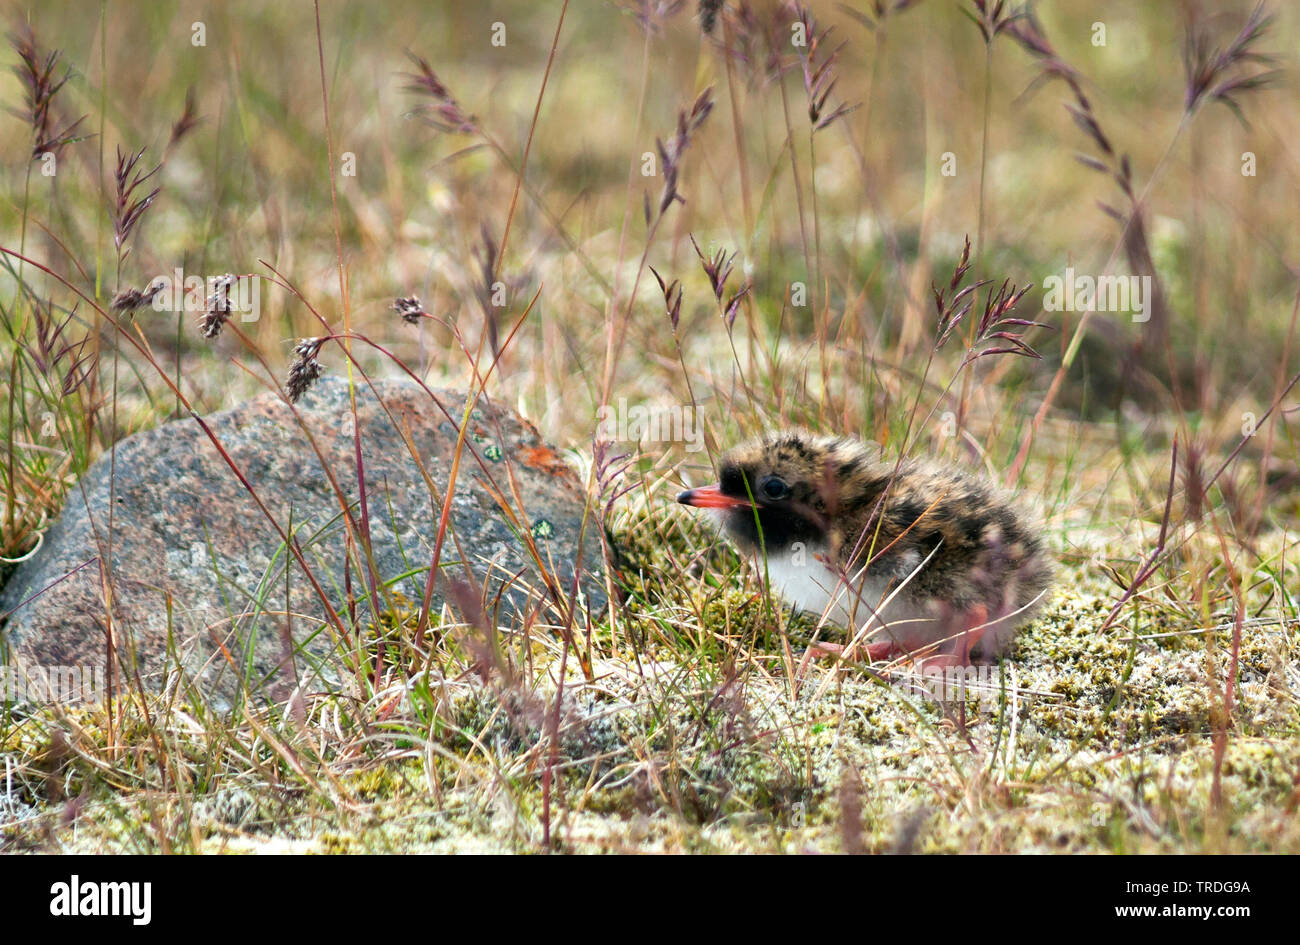 Kuestenseeschwalbe, Kuesten-Seeschwalbe (Sterna paradisaea), Kueken am Boden, Island | arctic tern (Sterna paradisaea), chick on the ground, Iceland | - Stock Image